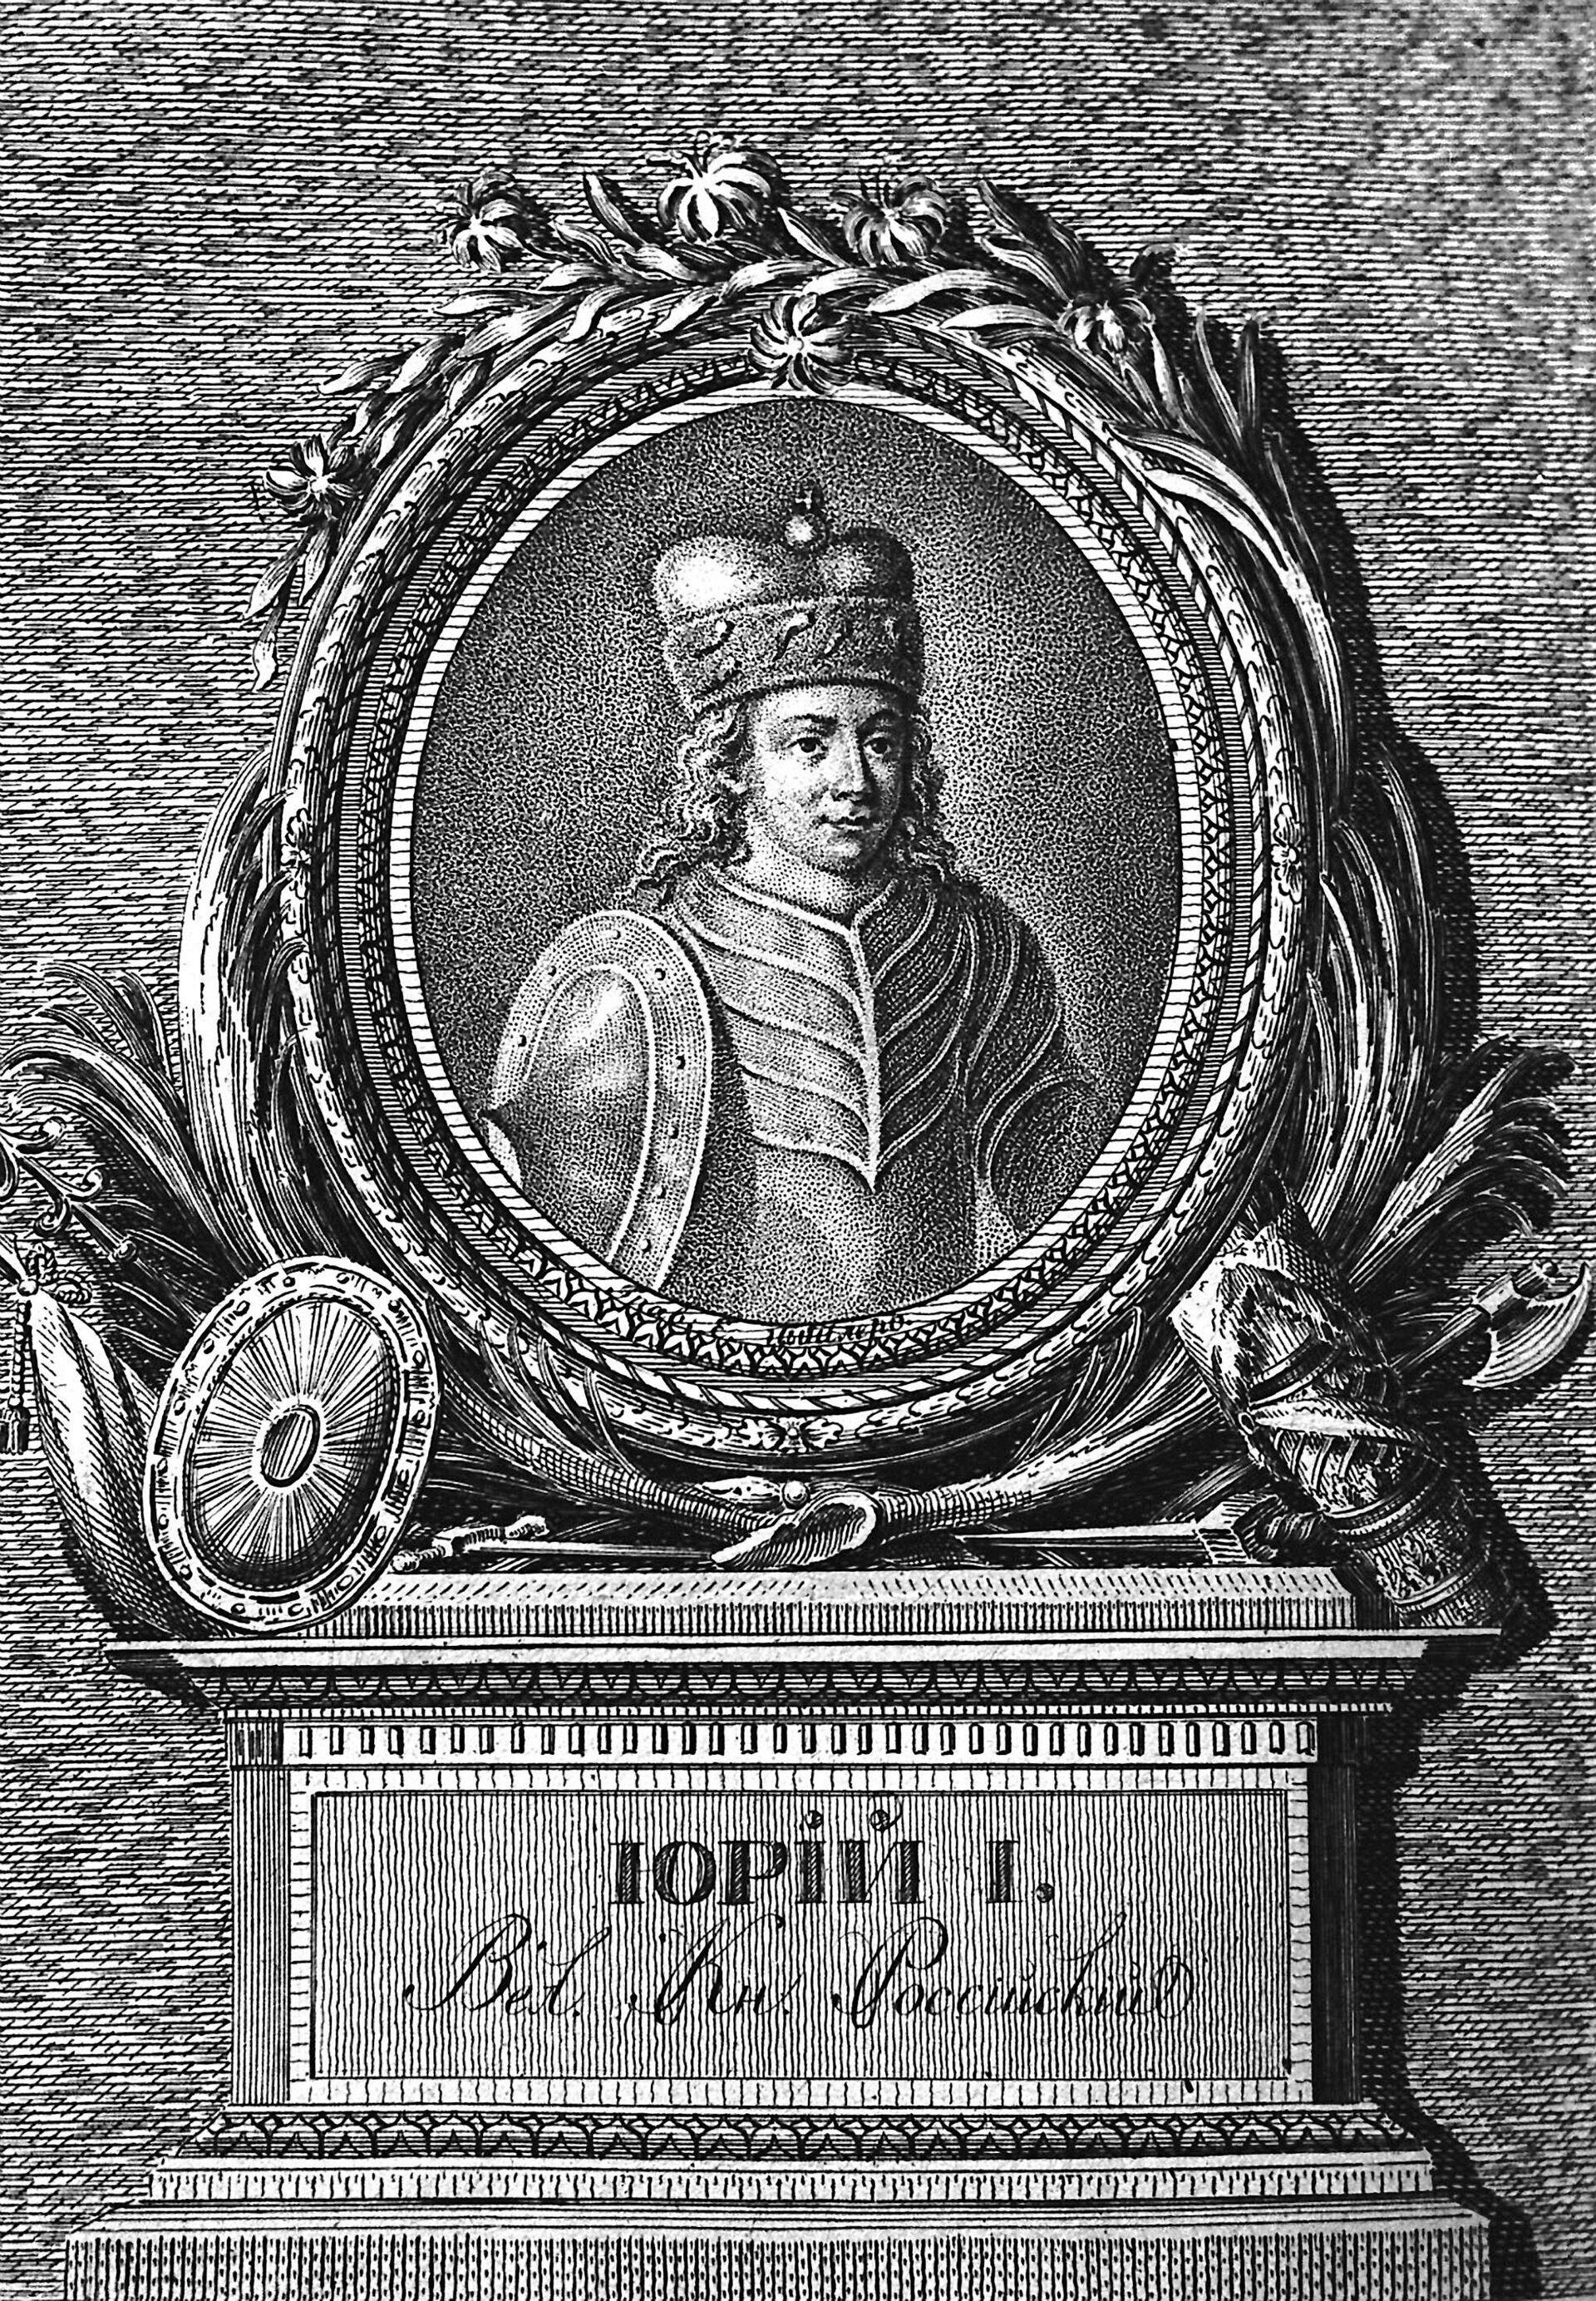 Великий князь Юрий (Георгий) I Долгорукий (ок.1090-1157).  - РИА Новости, 1920, 22.03.2021